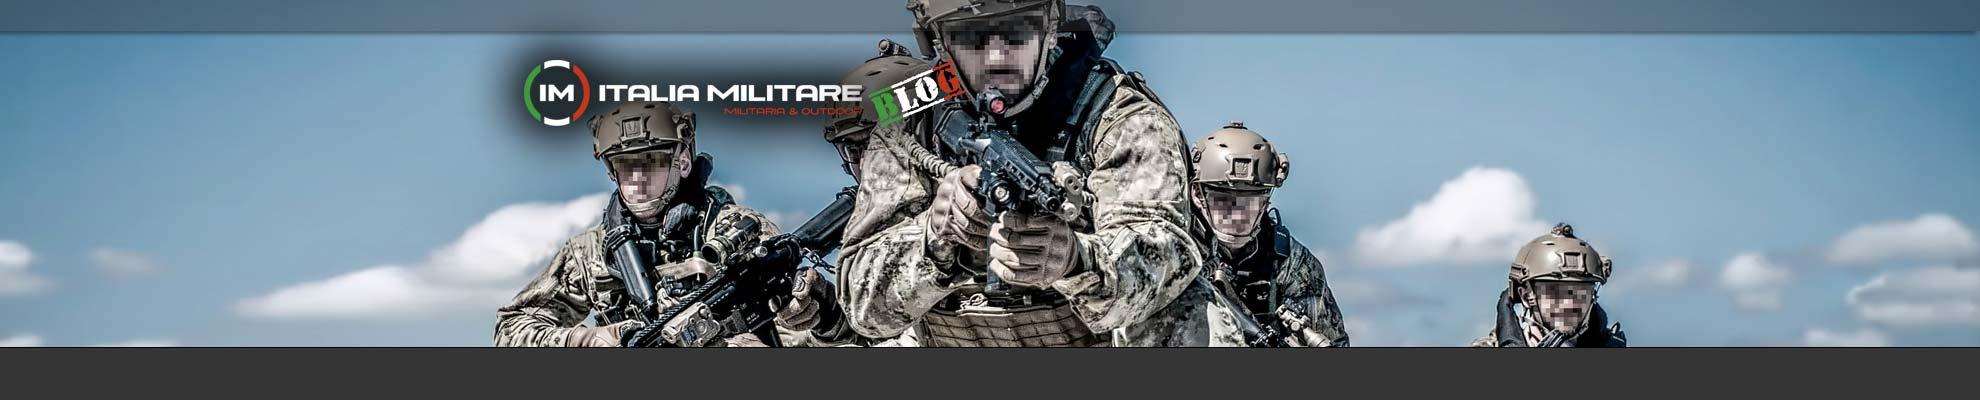 marina-militare-goi-banner-3